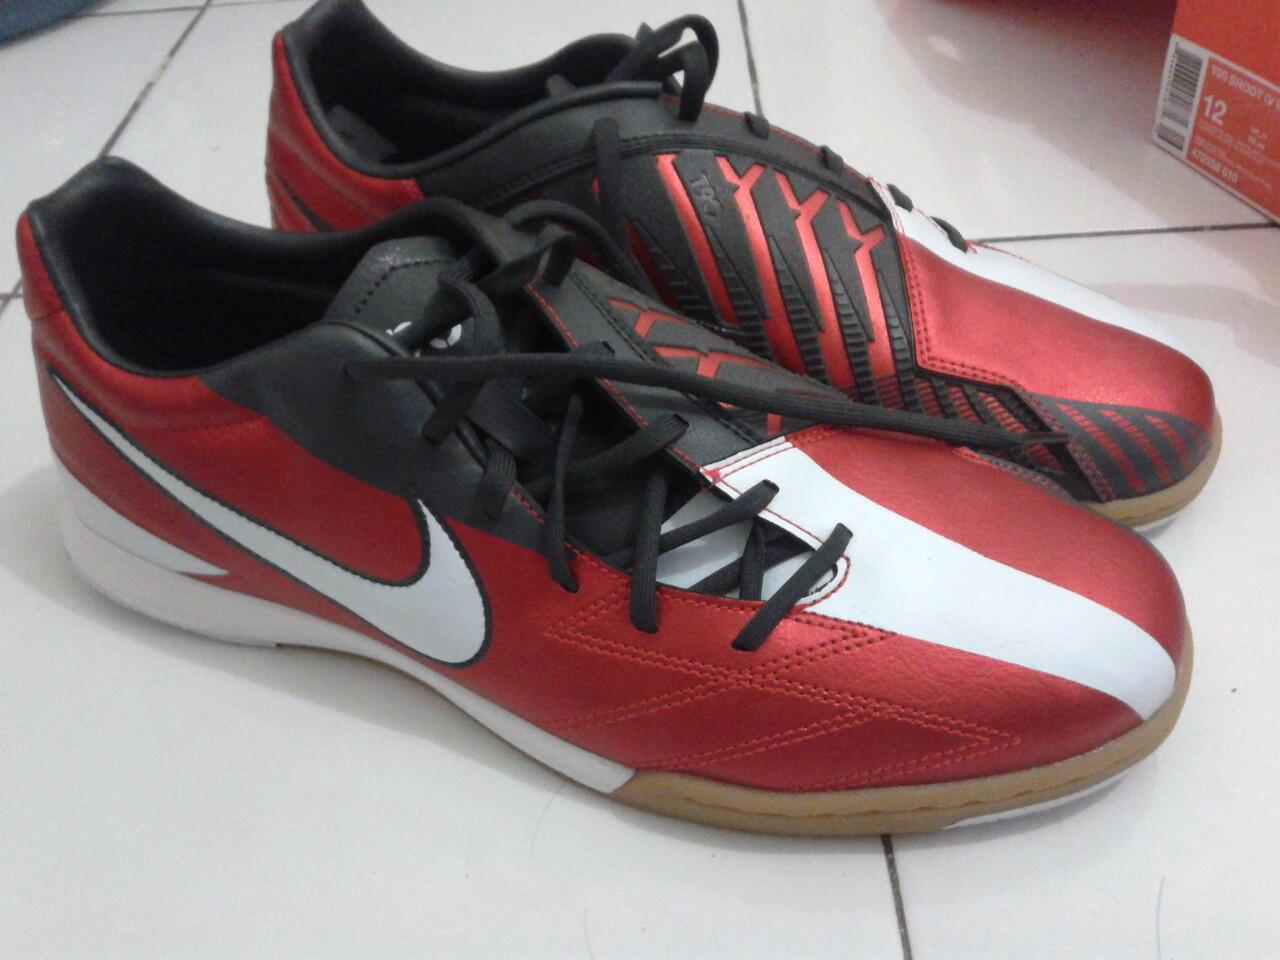 Jual sepatu bola/Soccer nike CTR 360 libretto fg (Iniesta) 100 % Original & BNIB